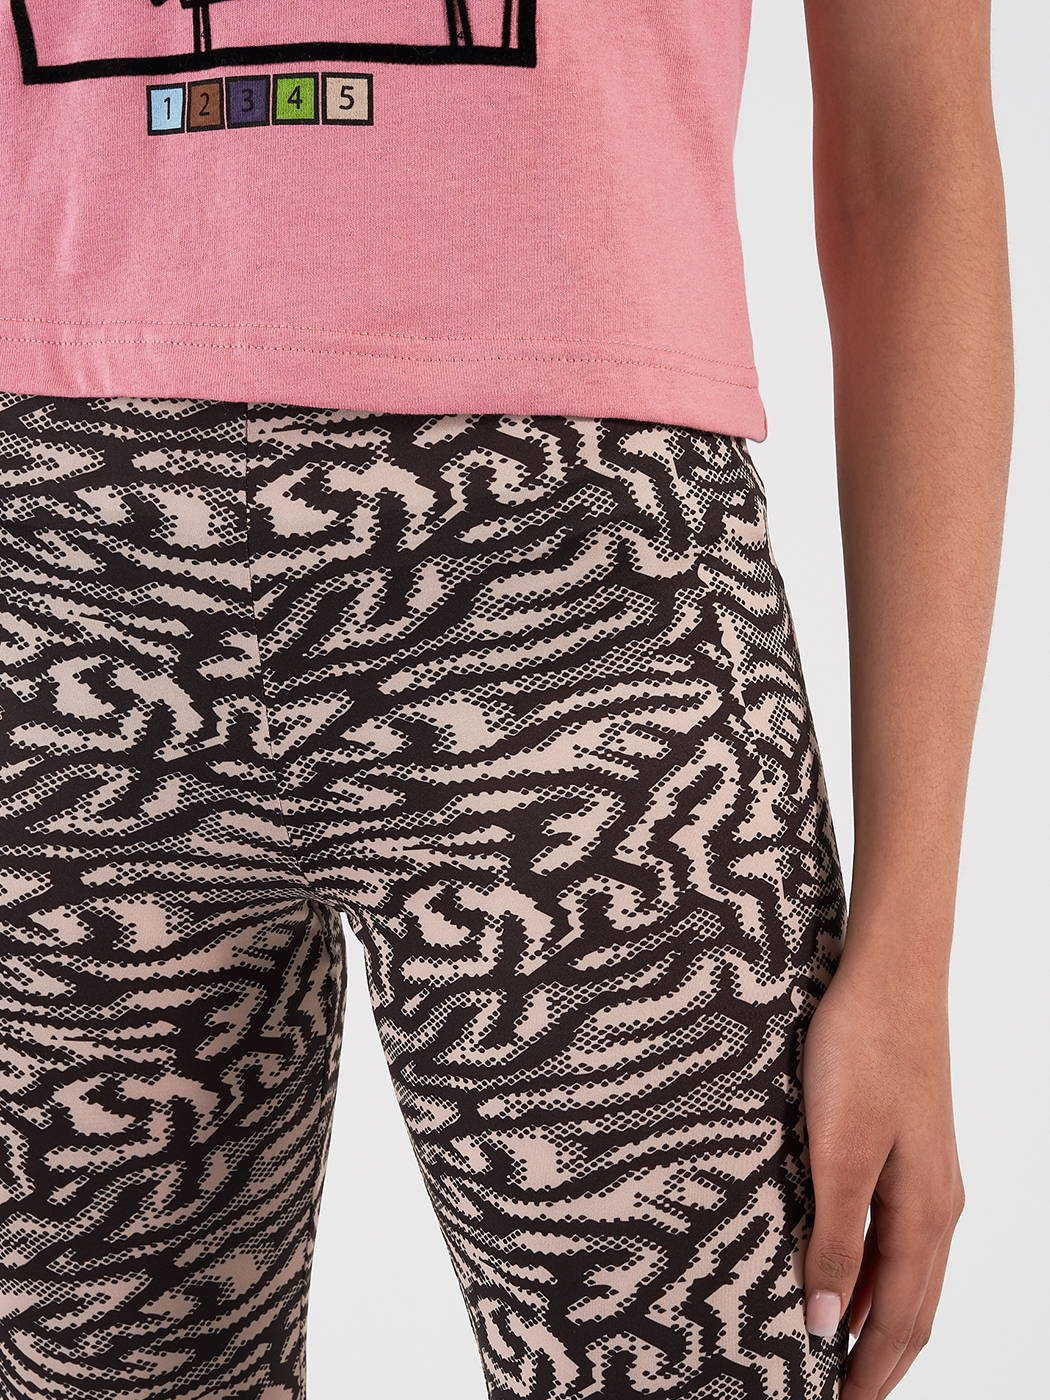 Shop the Maisie Wilen Mona Lisa T-Shirt and Brain Leggings